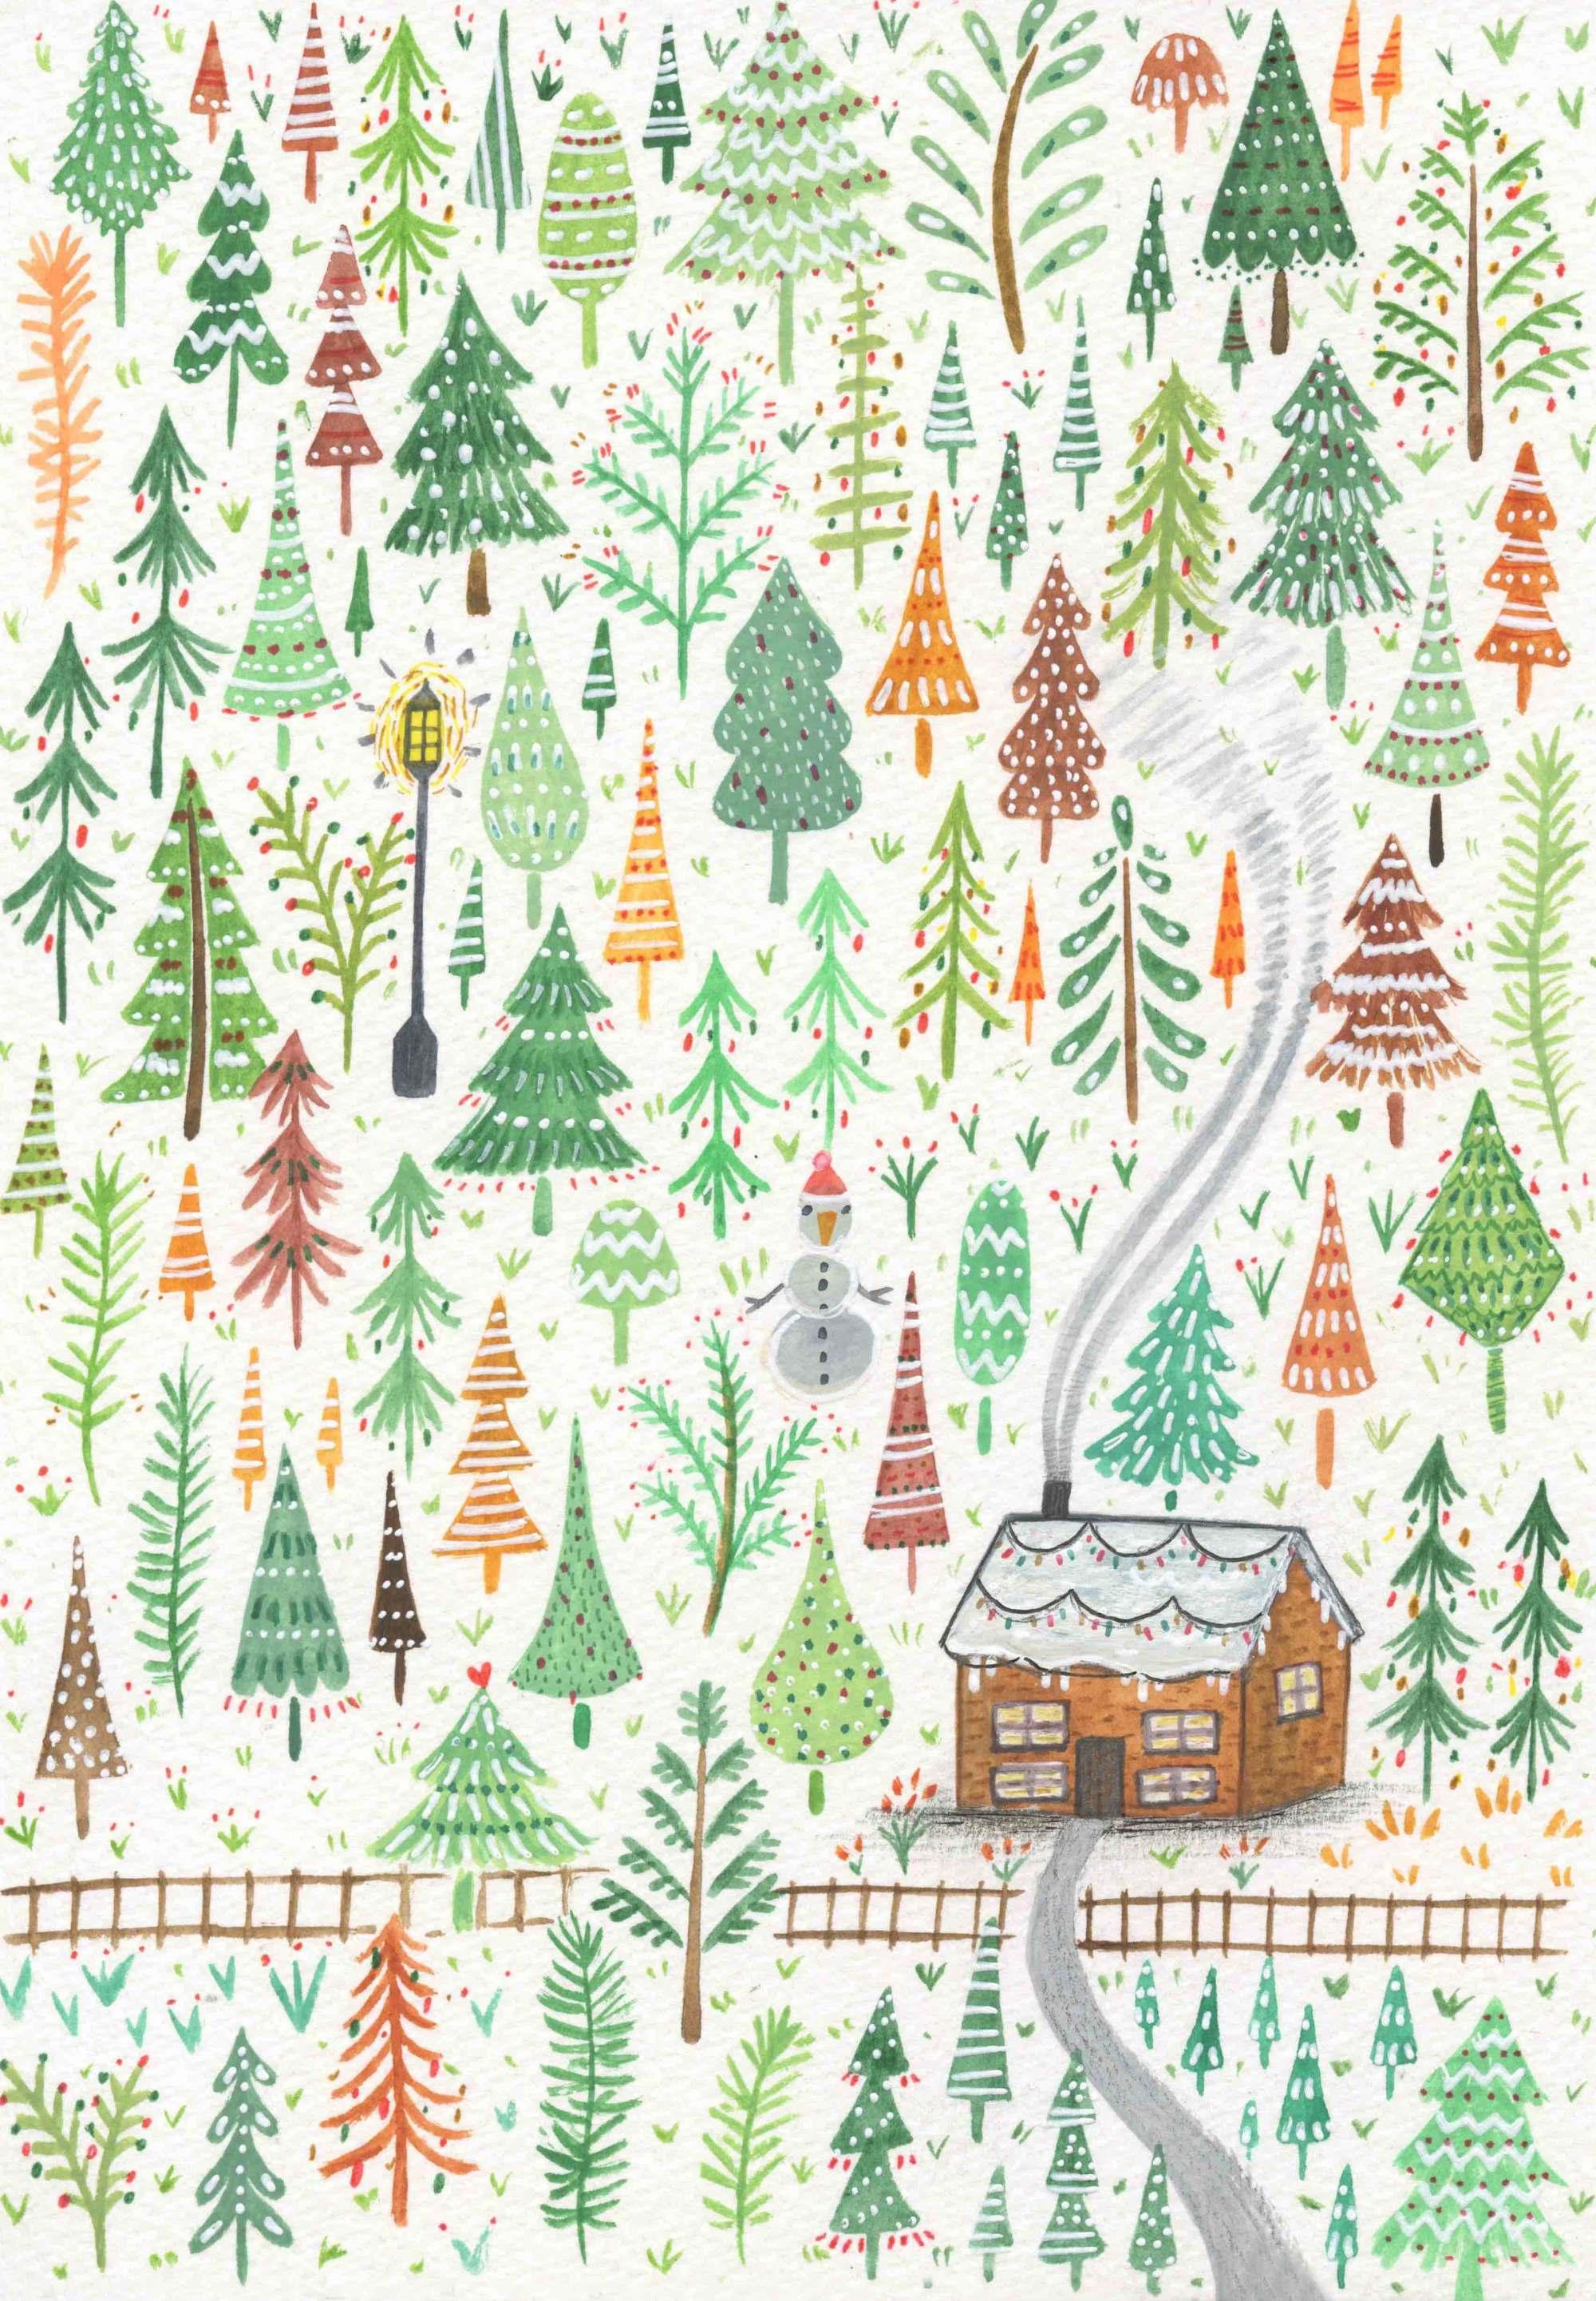 Greeting Cards Andrina Manon Illustration